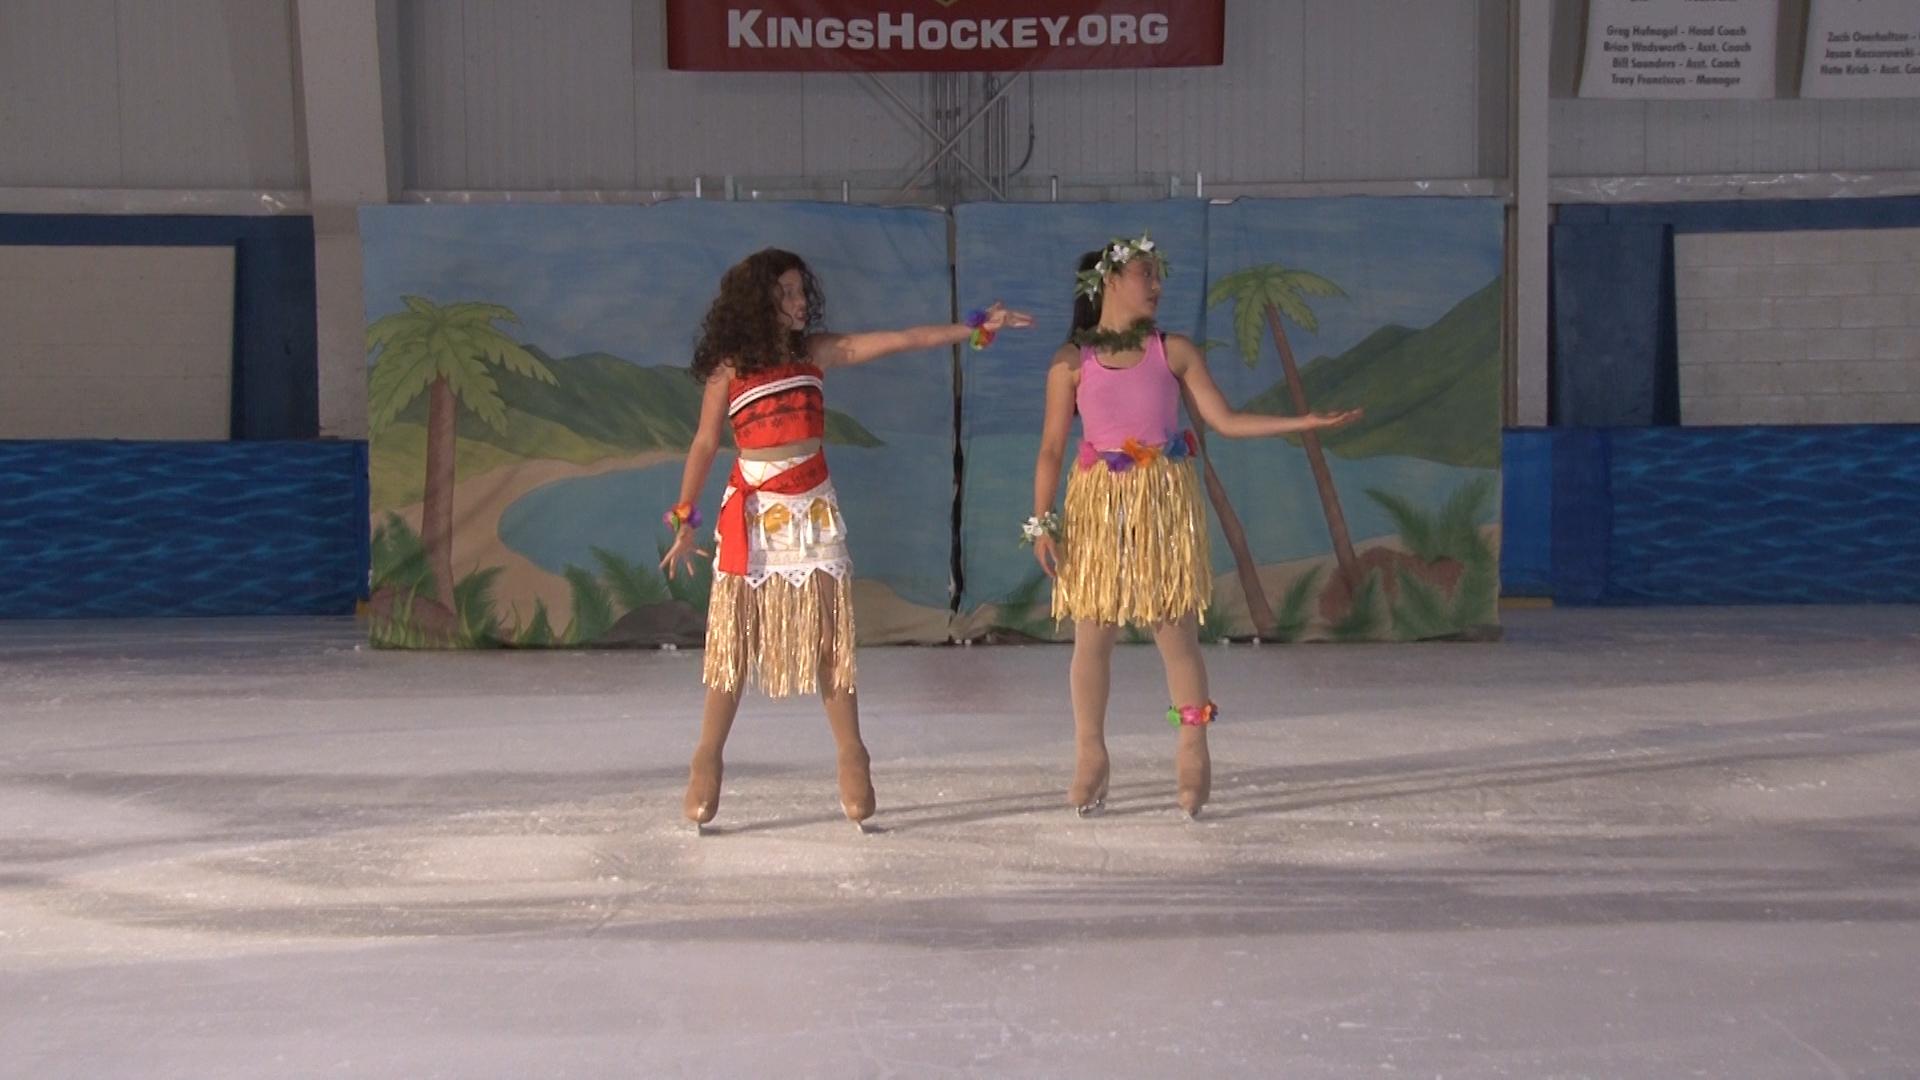 Power Play Maui Skate on Ice 071417.00_16_50_03.Still030.jpg